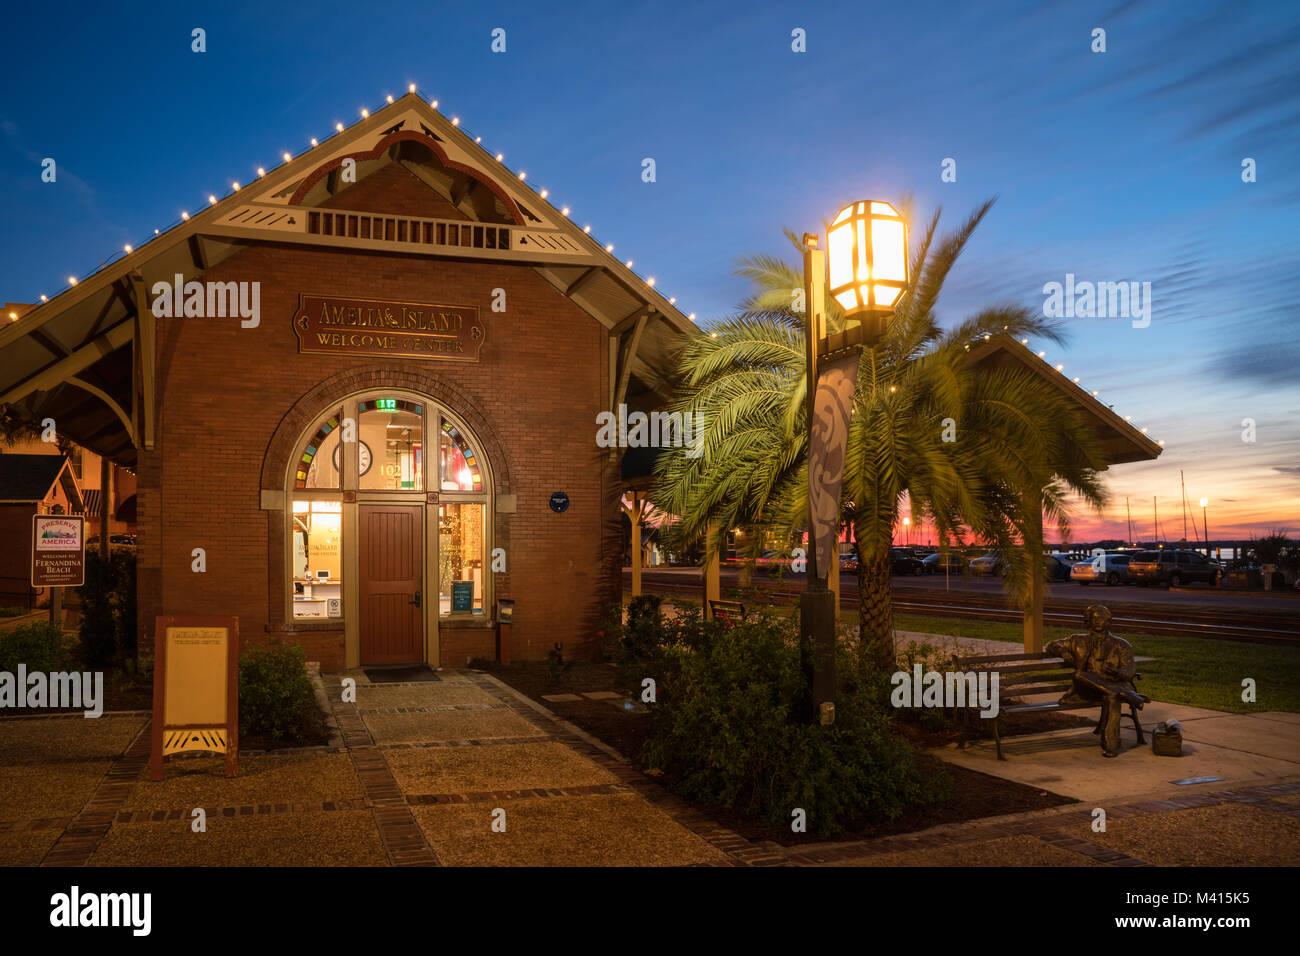 Historic Downtown Centre Street Train Station at Night, Amelia Island, Florida - Stock Image